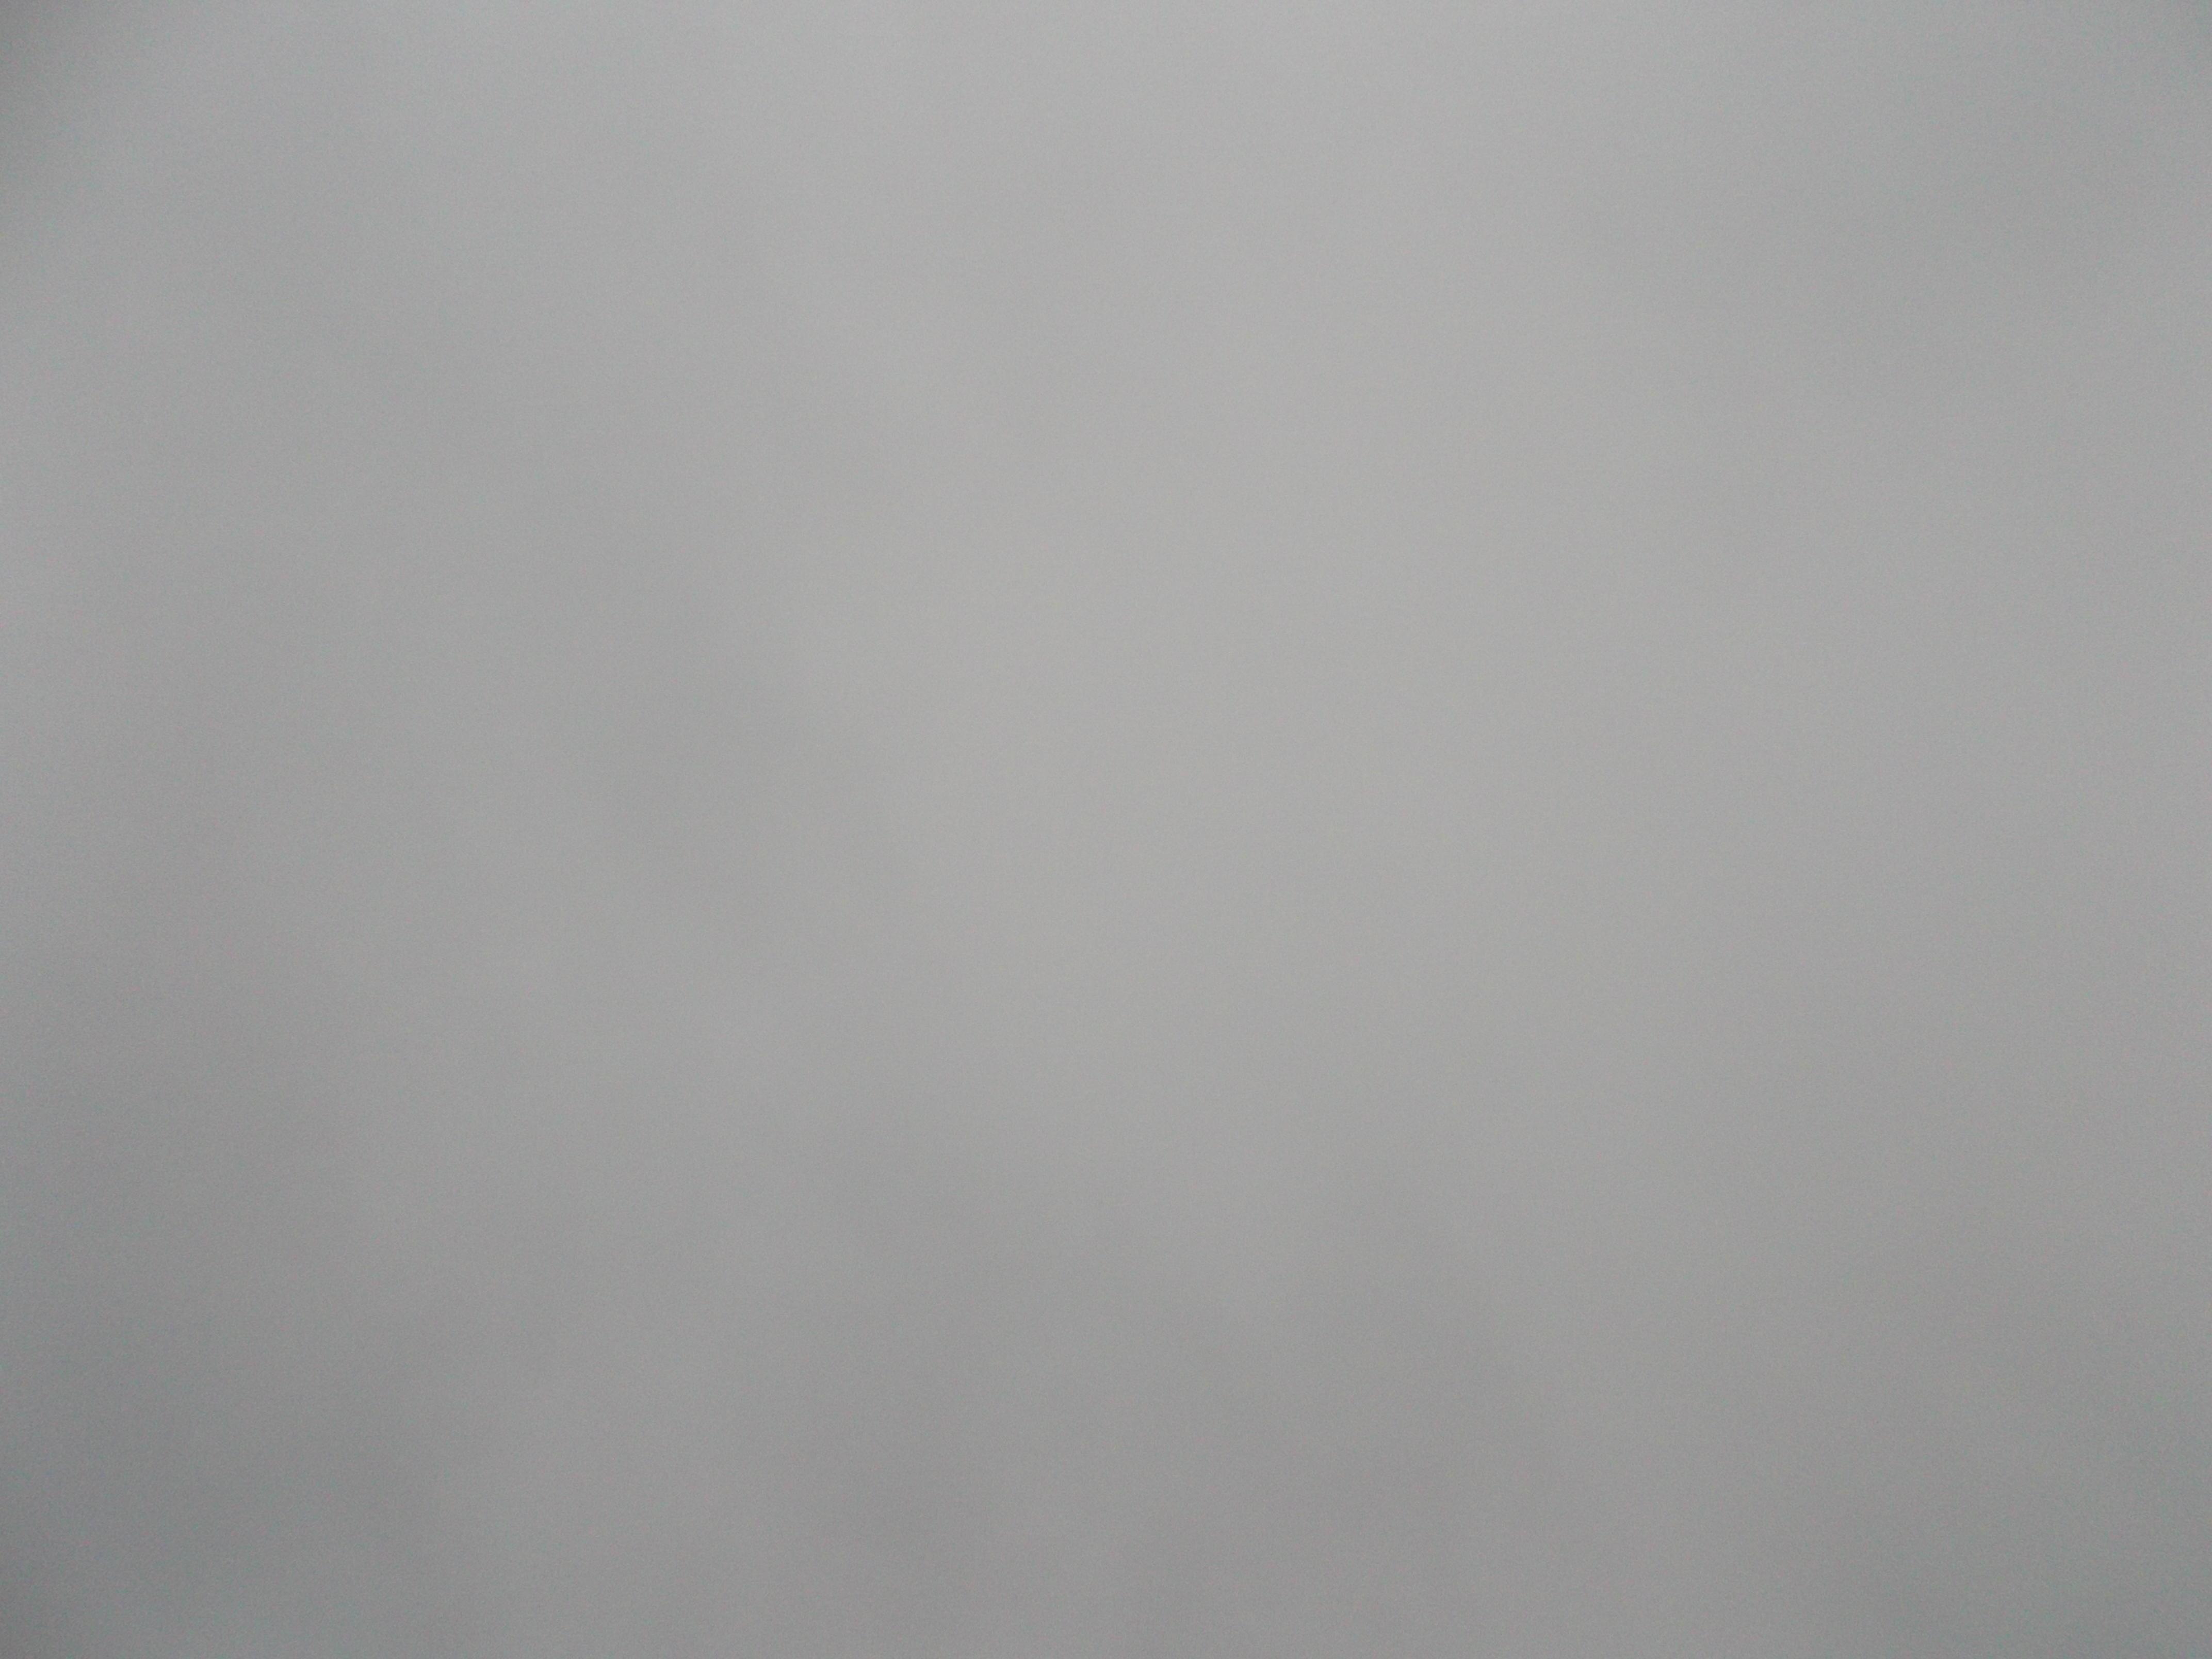 2013-01-10 Longitude -0.371 Latitude 49.182 Altitude 13 Heure 11h39